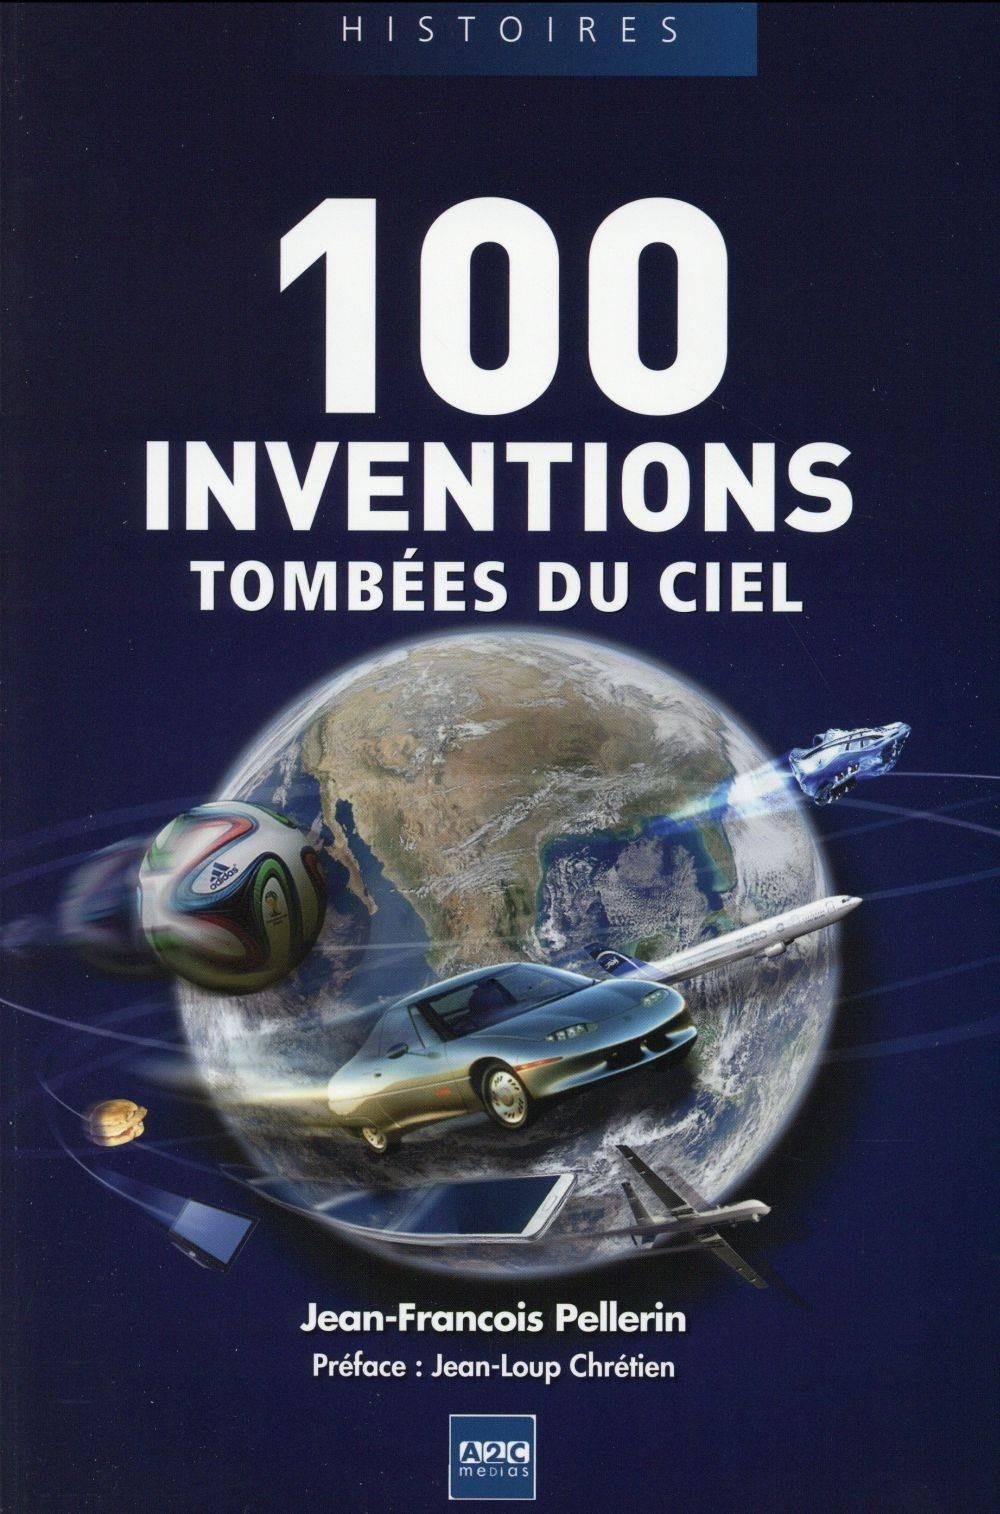 m diath que de quimperl conf rence 100 inventions tomb es du ciel par jean fran ois pellerin. Black Bedroom Furniture Sets. Home Design Ideas